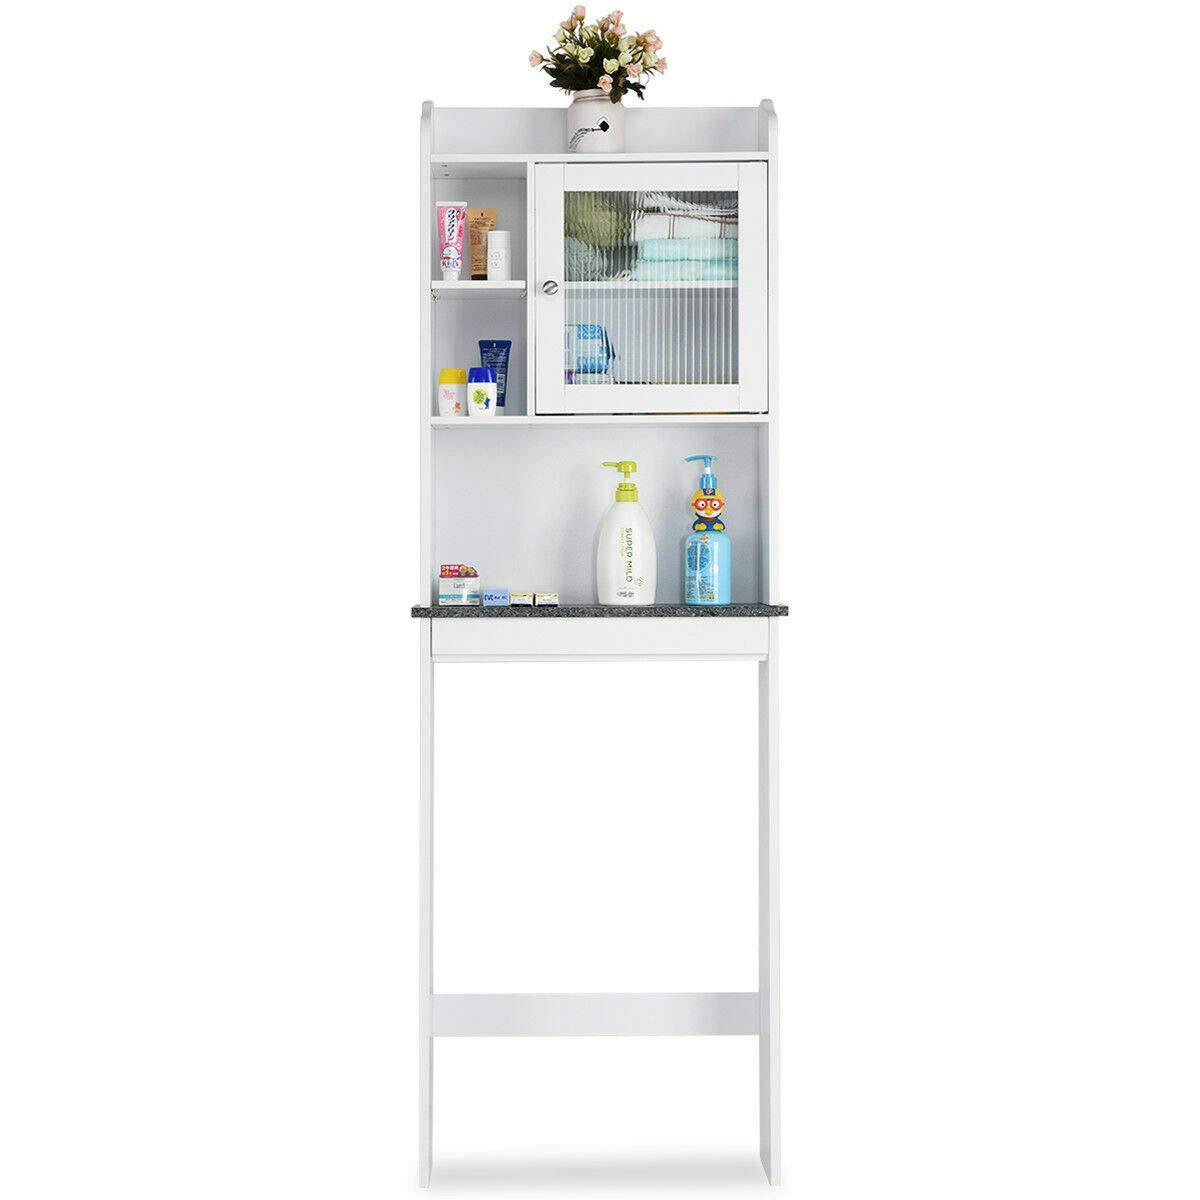 allgoodsdelight365 Over-The-Toilet Bath Cabinet Bathroom Space Saver Storage Organizer White